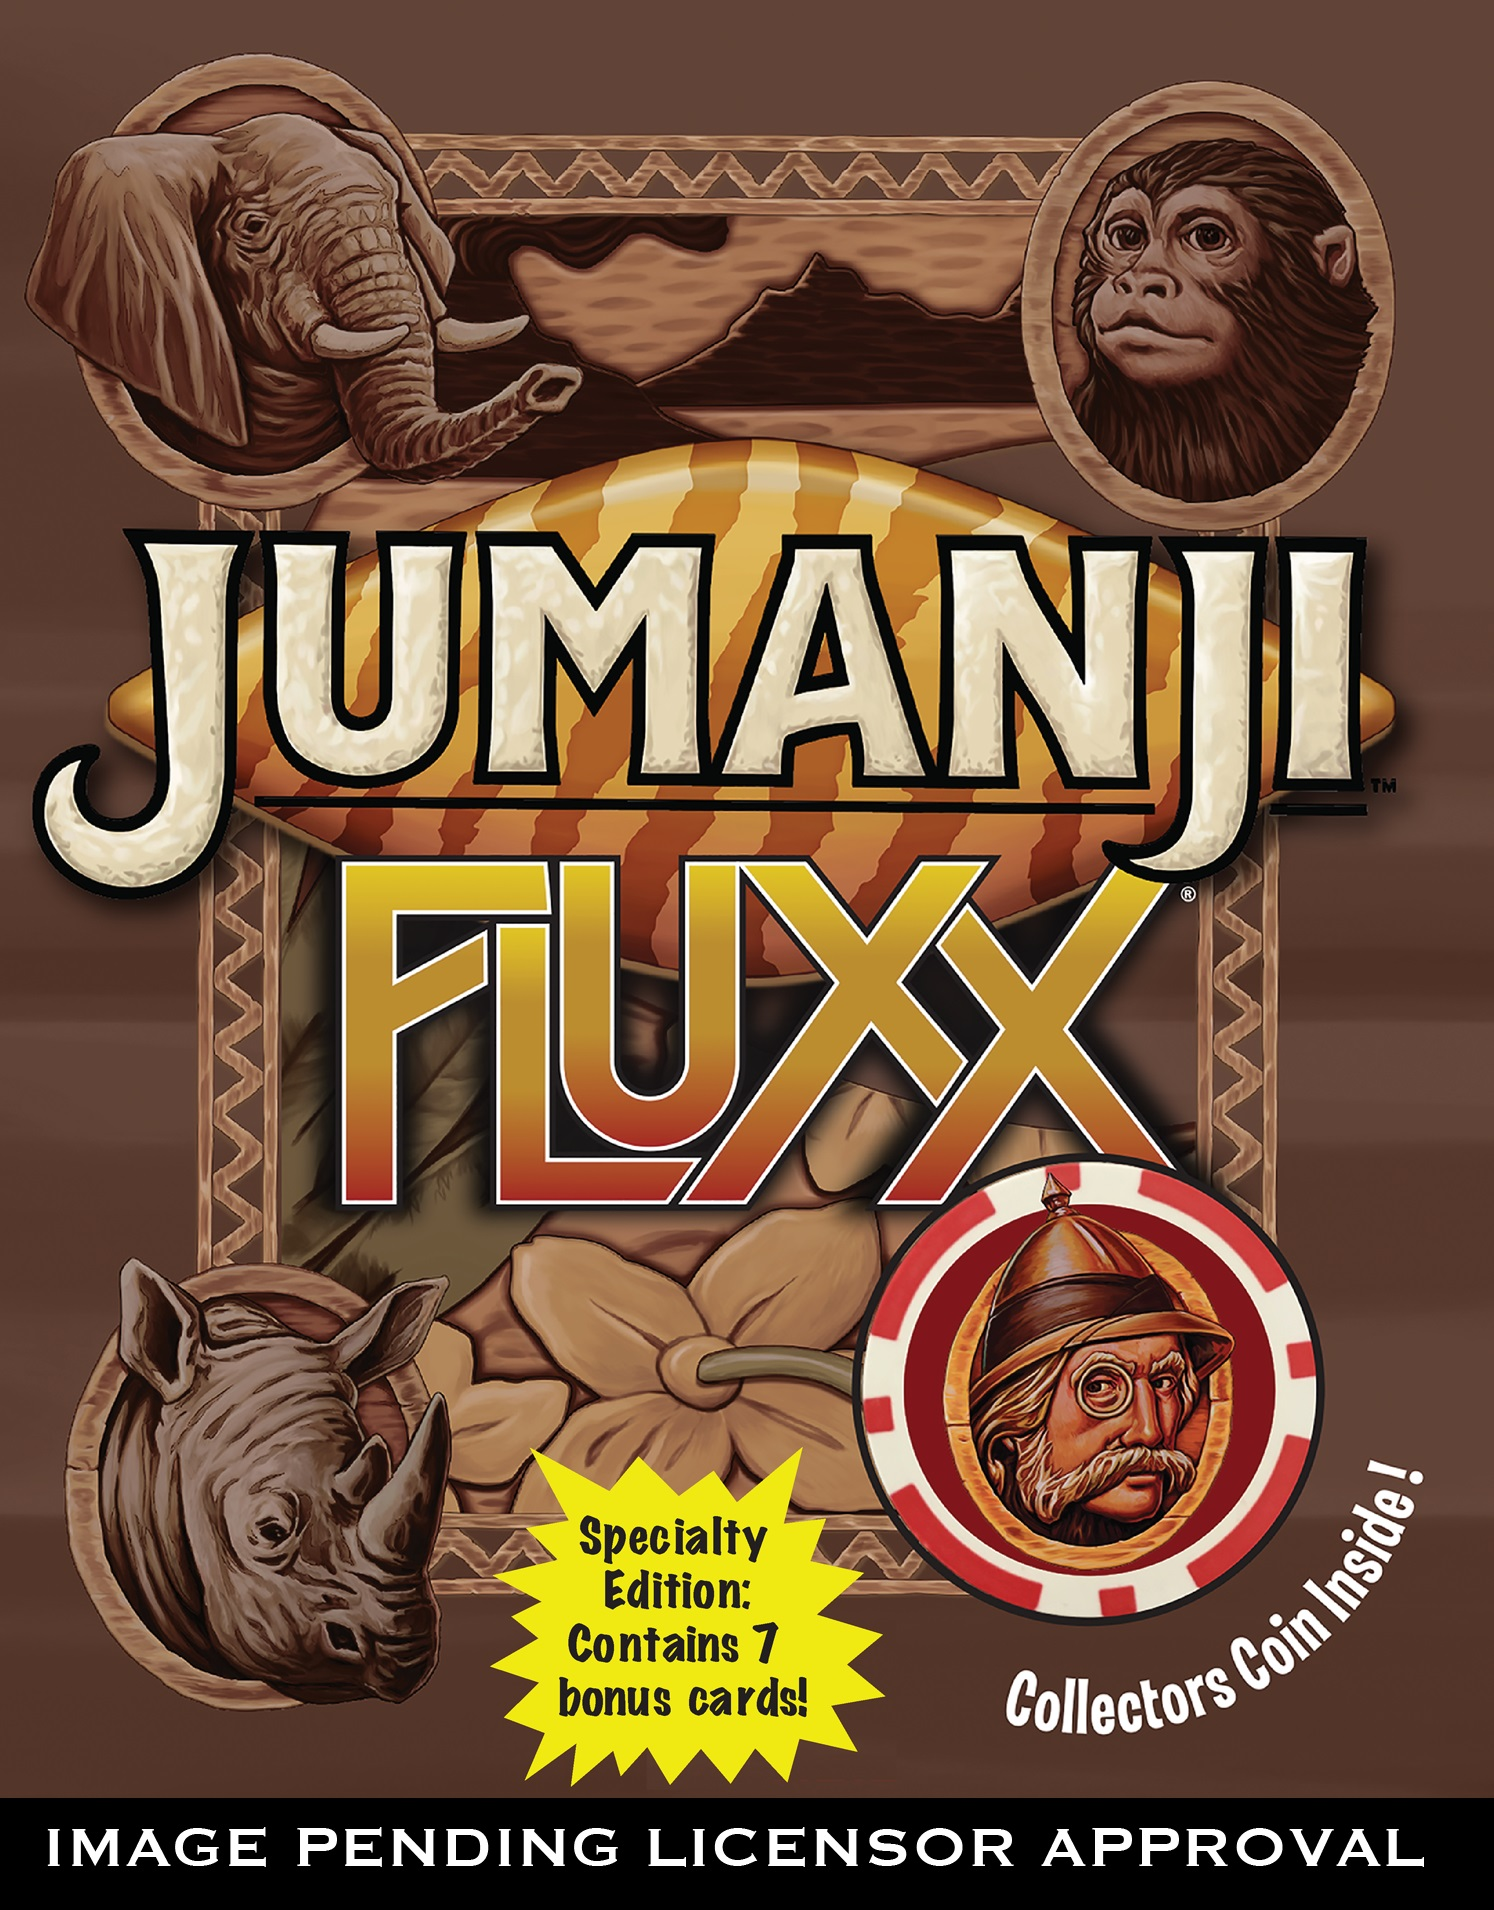 Jumanji Fluxx Demo Game Box